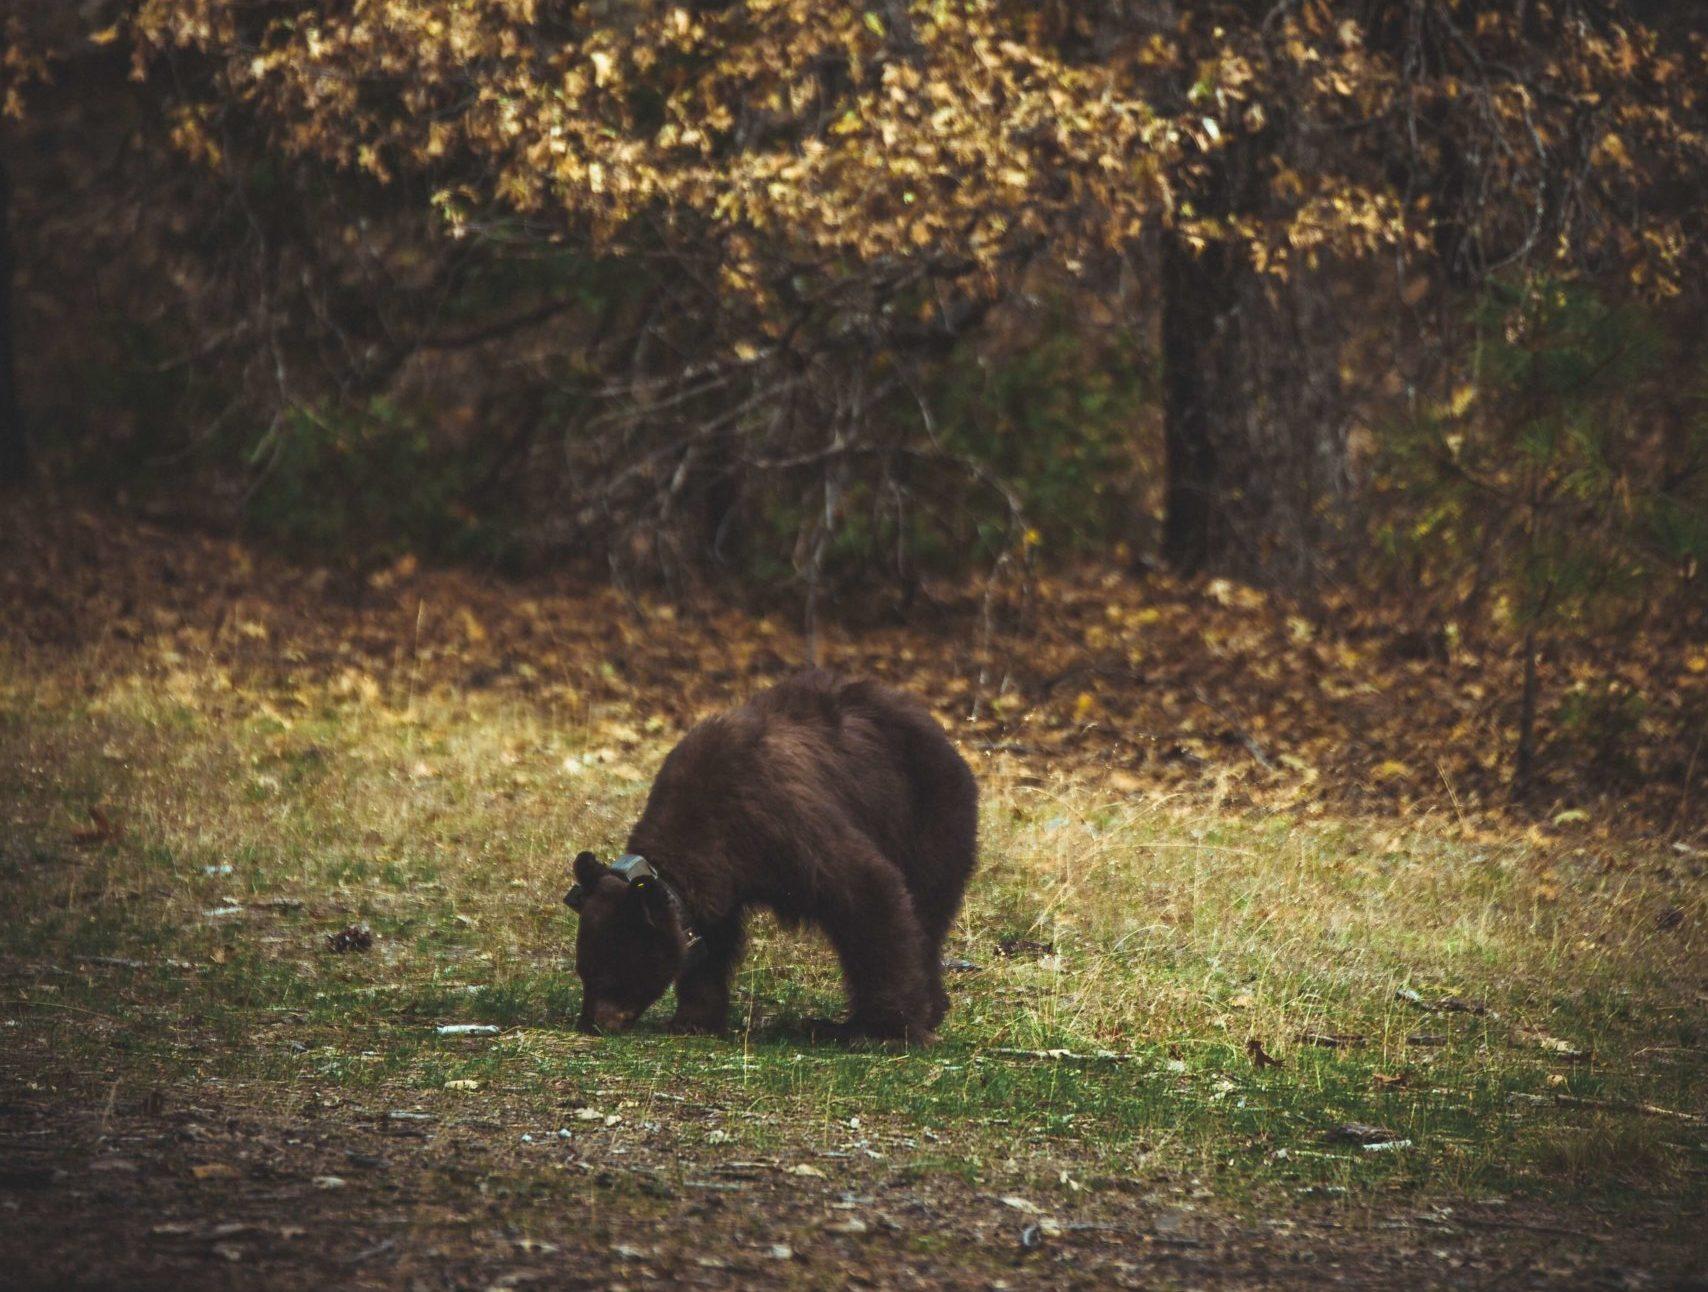 Yosemite National Park wildlife